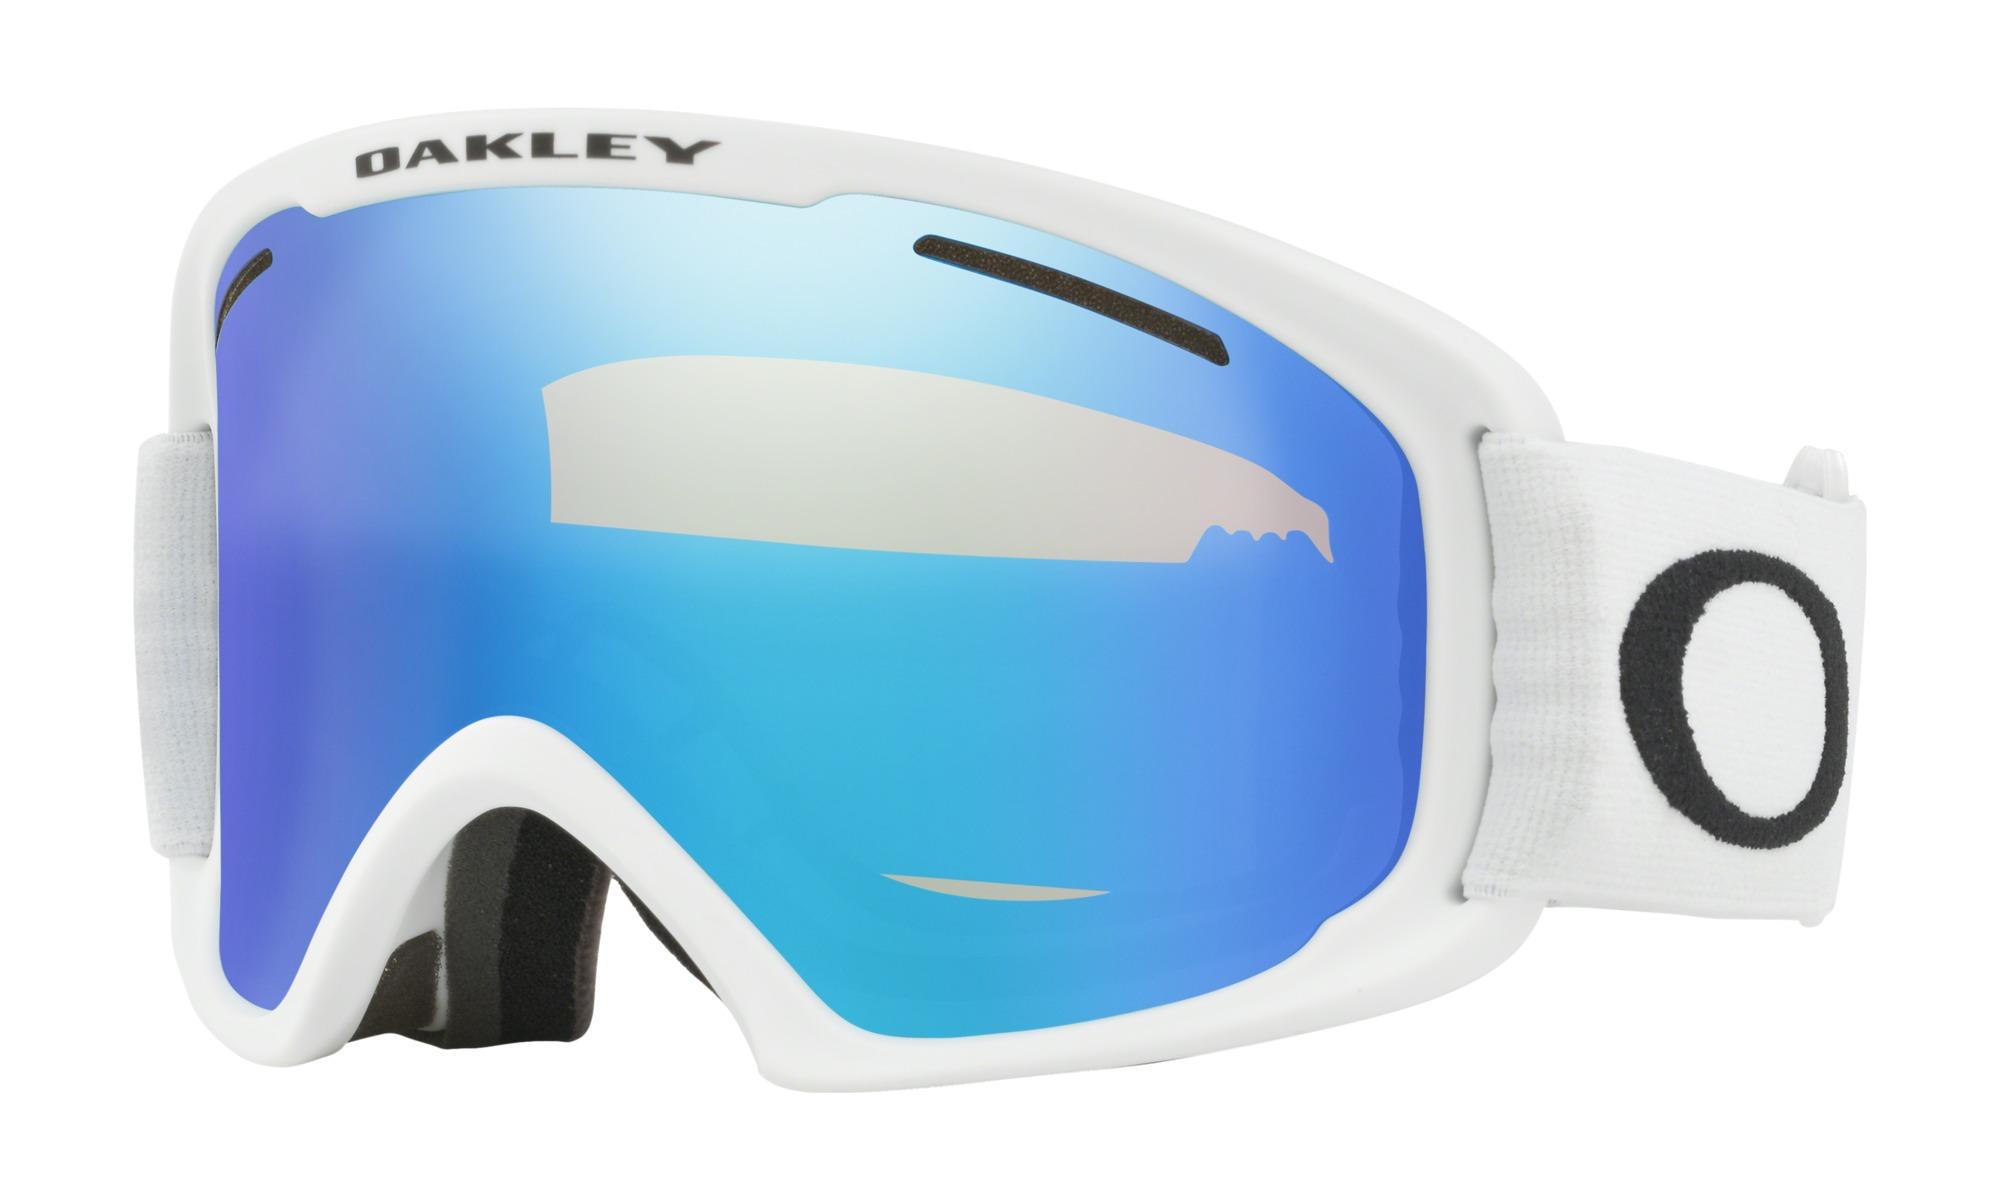 OAKLEY O-Frame 2.0 XL goggle